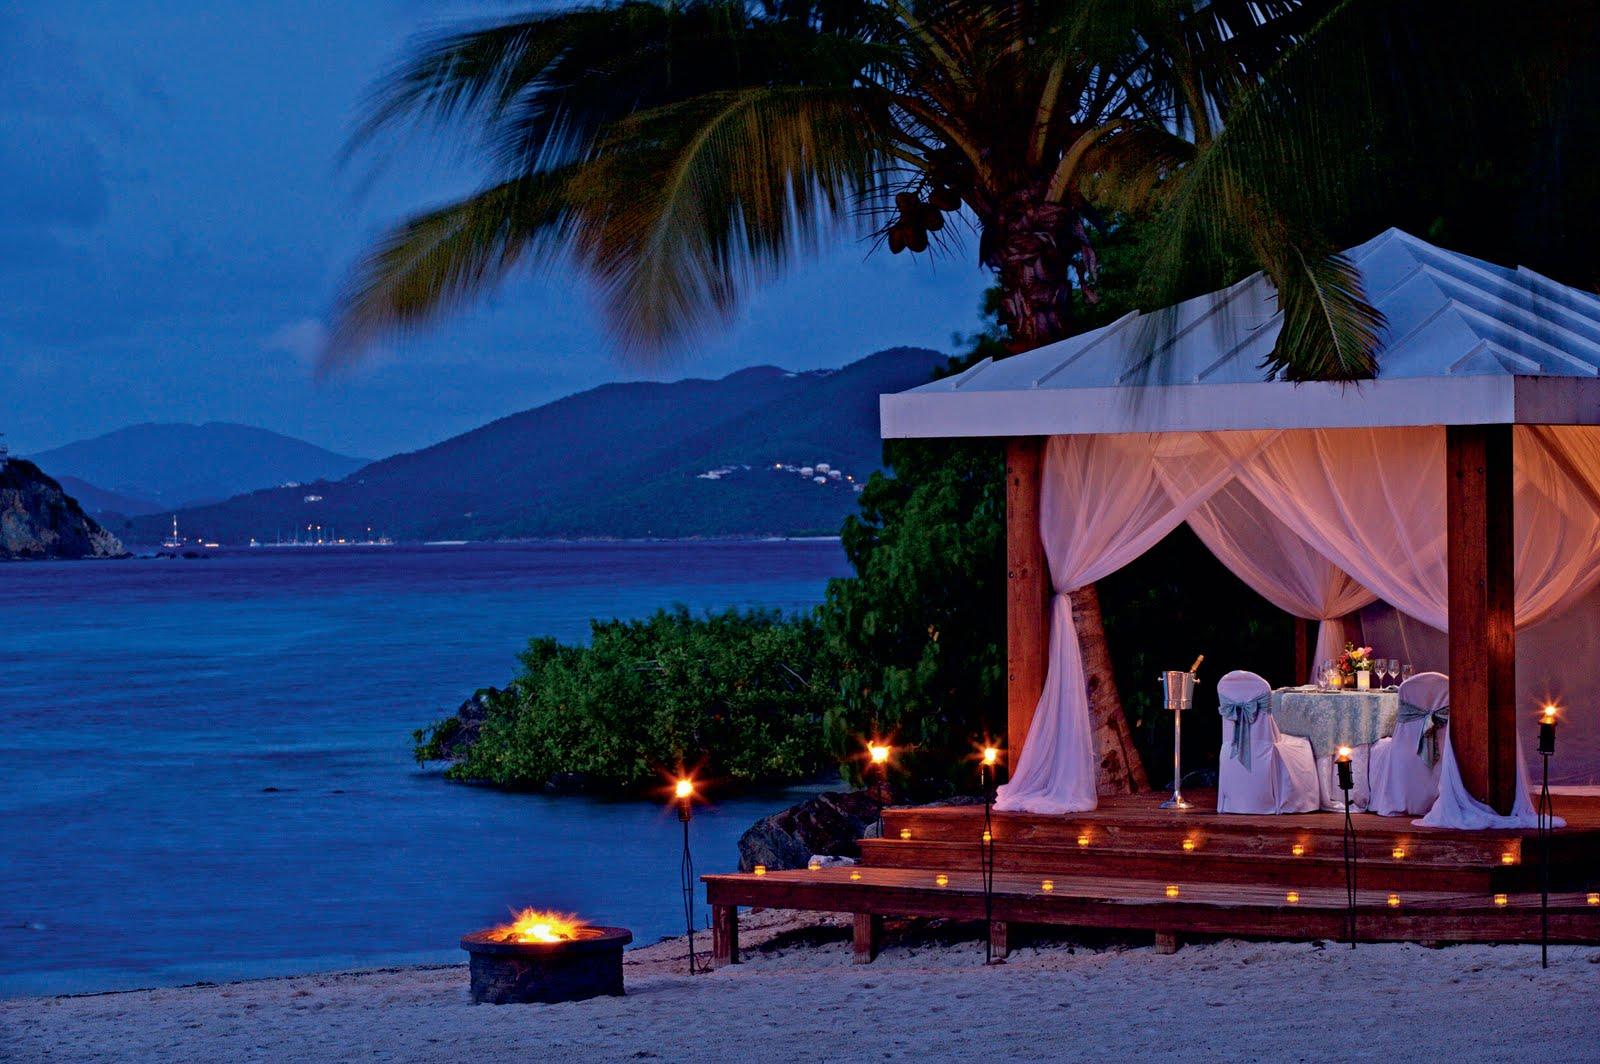 Chentamarissa things i loike n dream for Honeymoon in st thomas